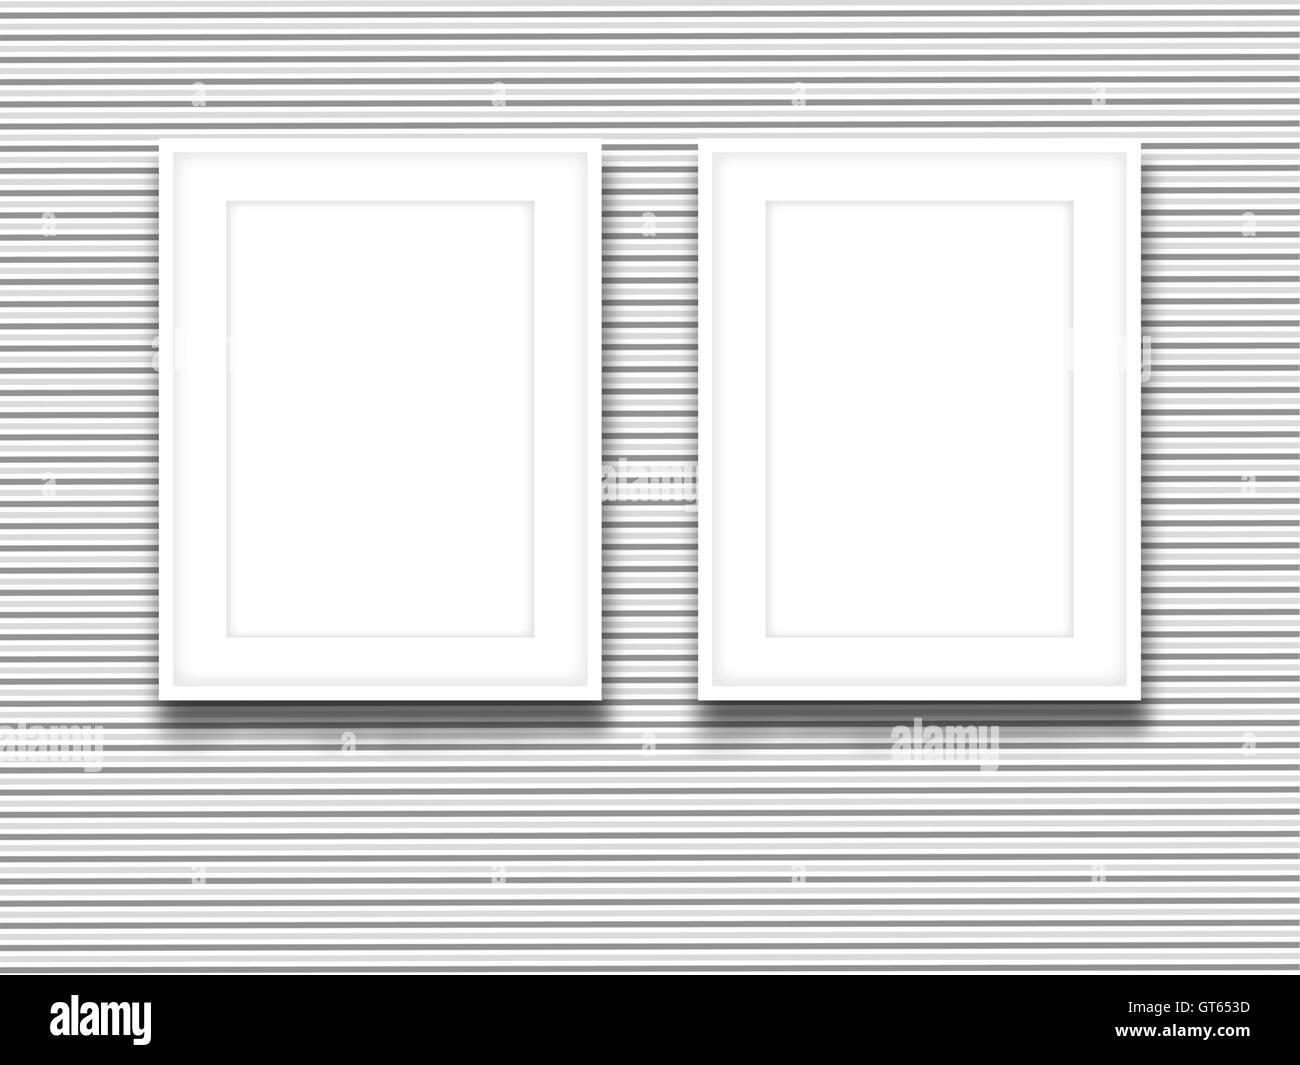 Close-up de dos marcos de imagen en blanco sobre negro, papel tapiz ...